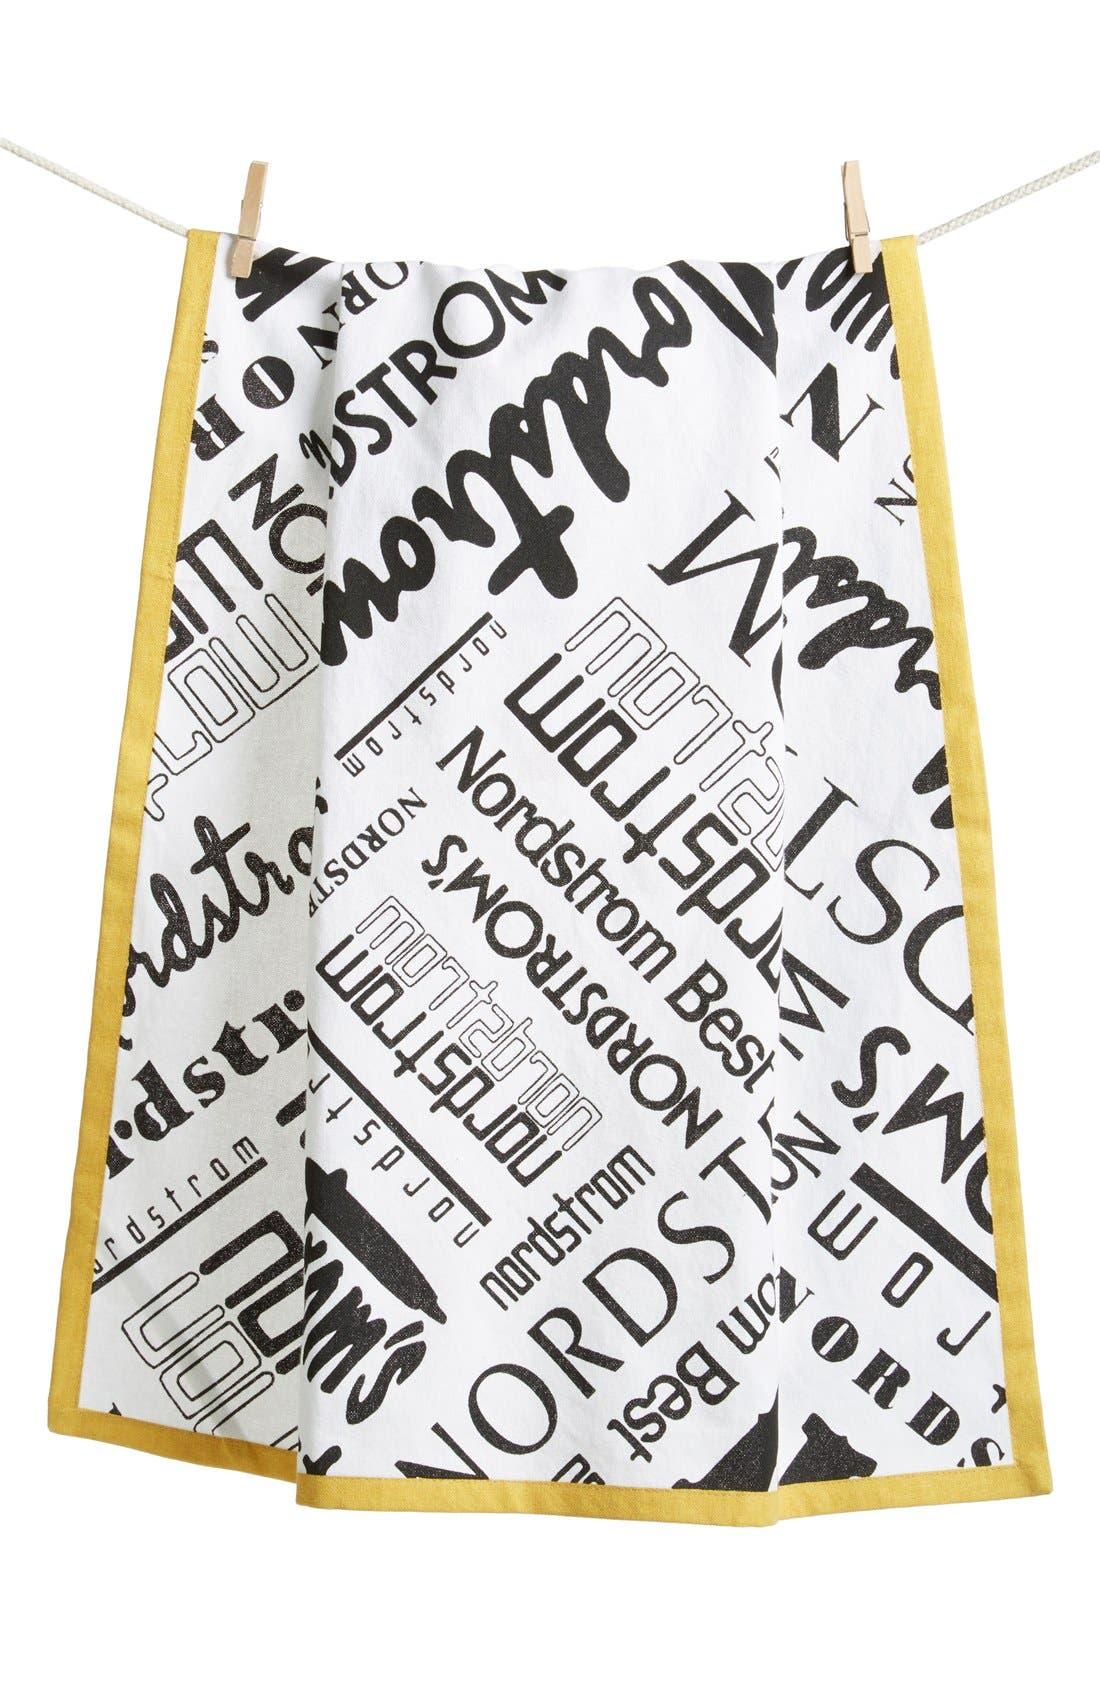 Alternate Image 1 Selected - Nordstrom Heritage Collection Logo Tea Towel